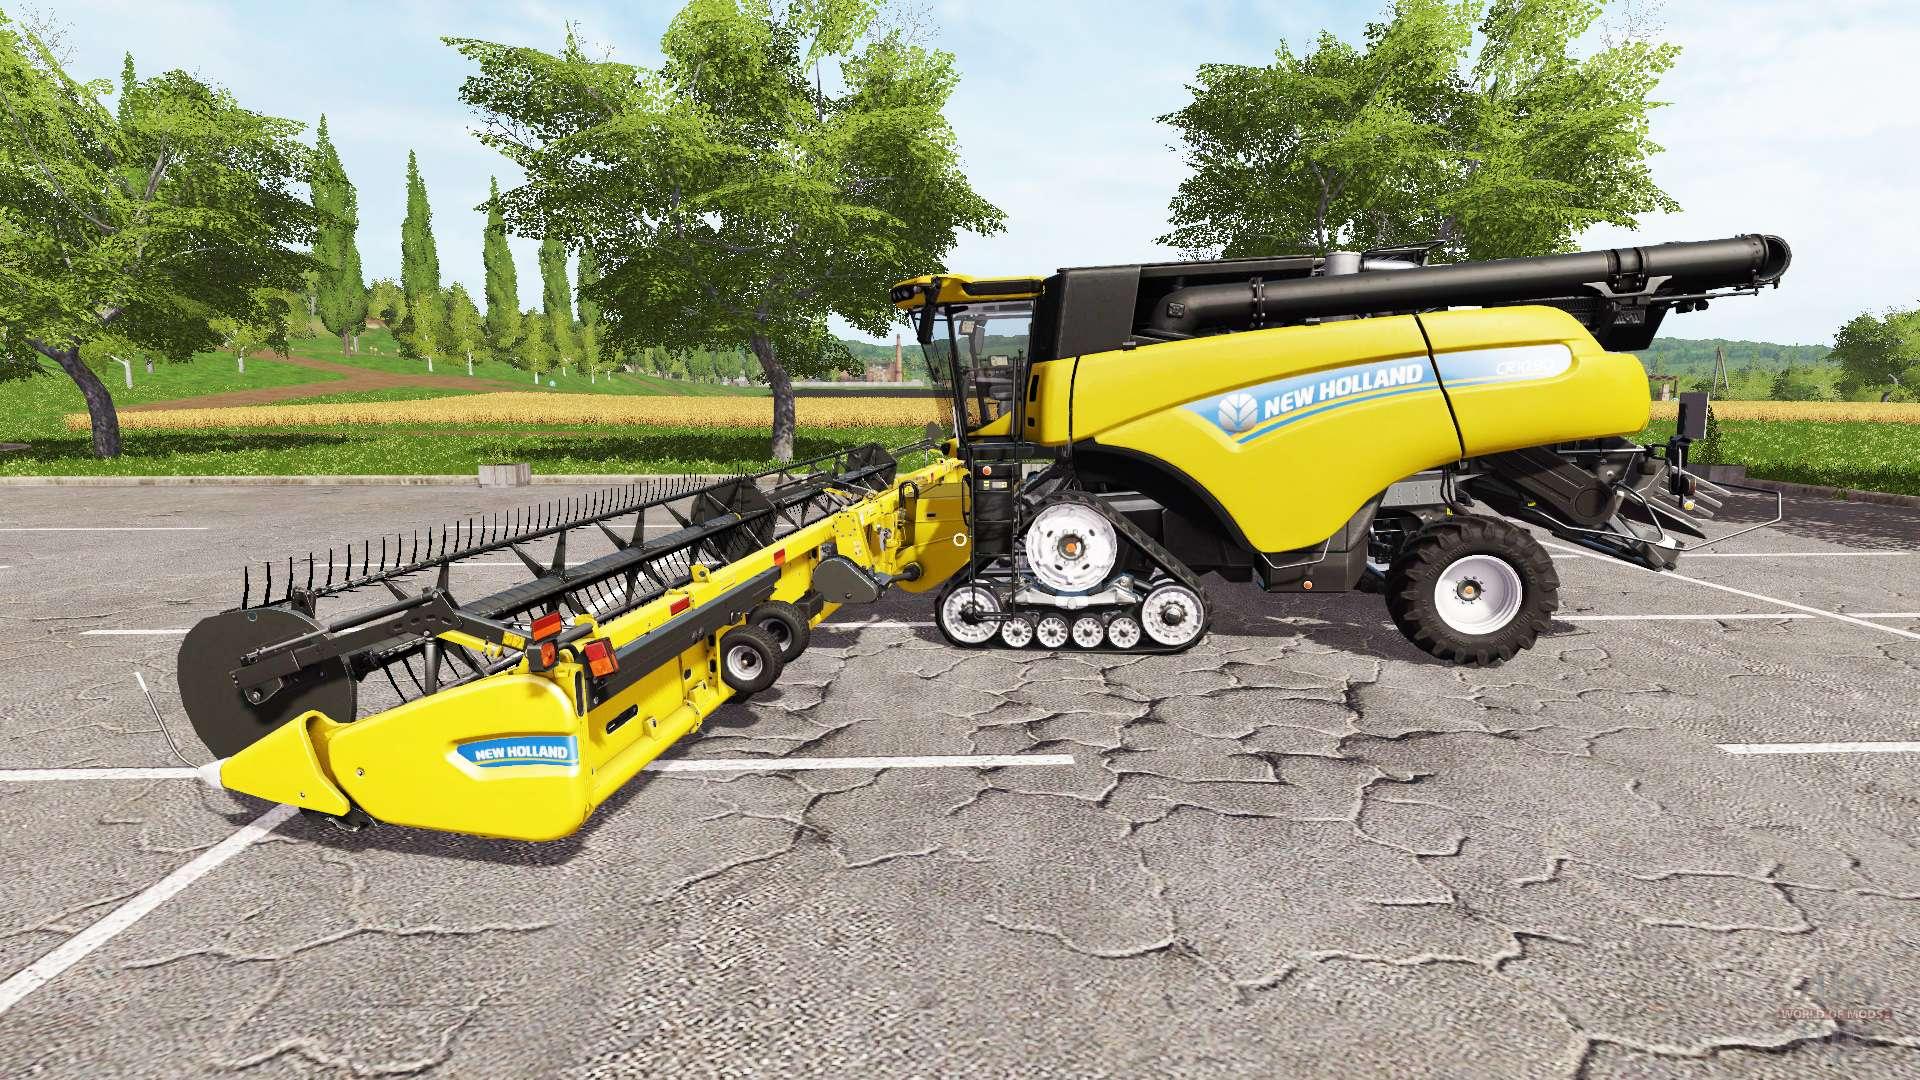 New Holland CR10 90 multicolor v2 0 for Farming Simulator 2017